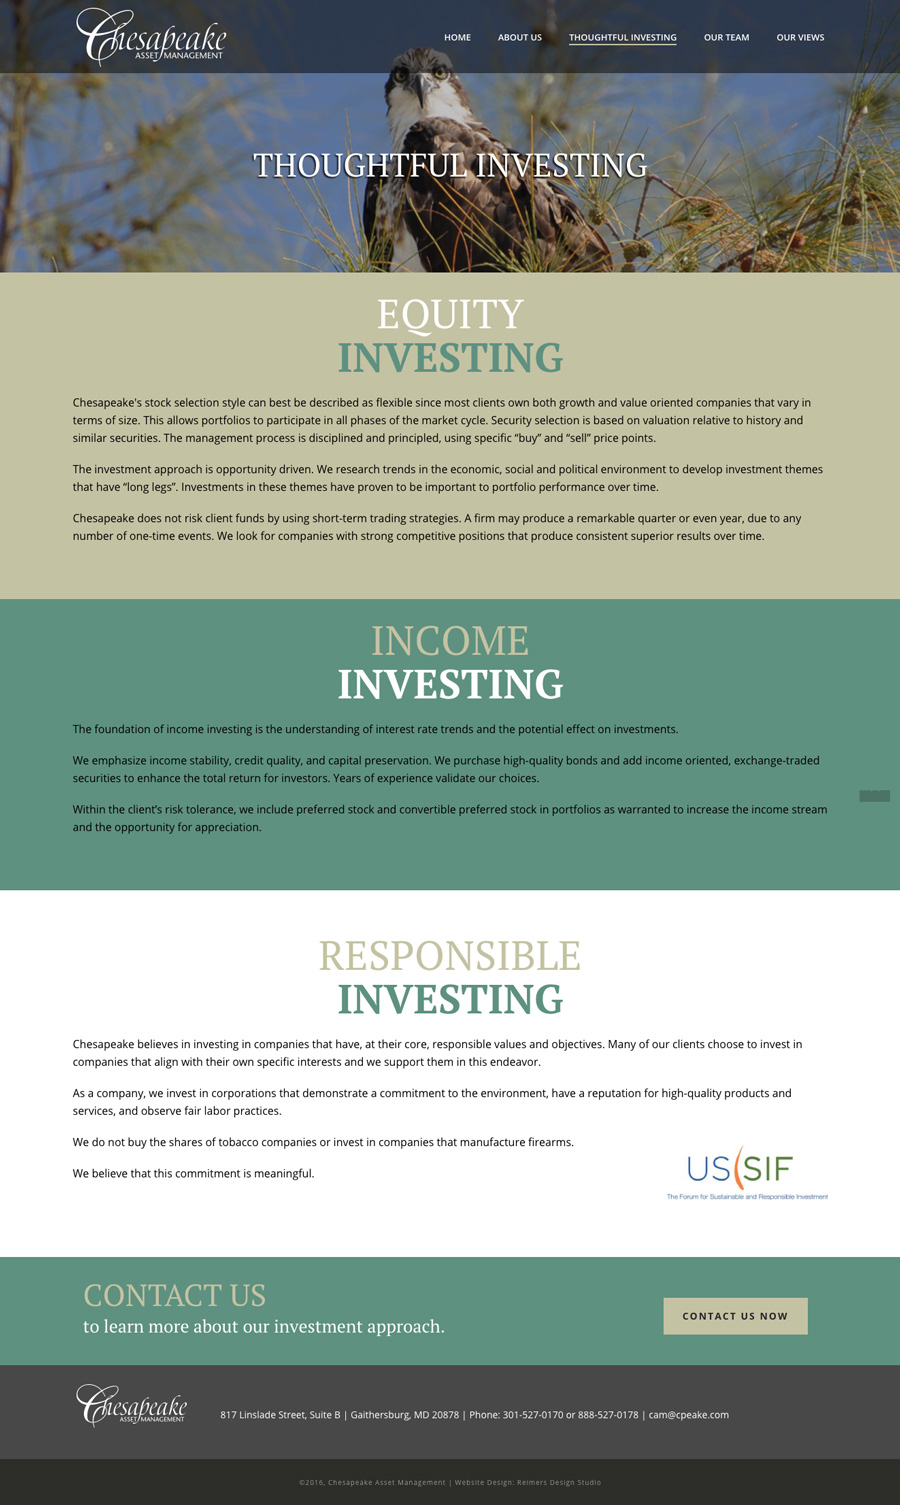 Chesapeake Asset Management Thoughtful Investing